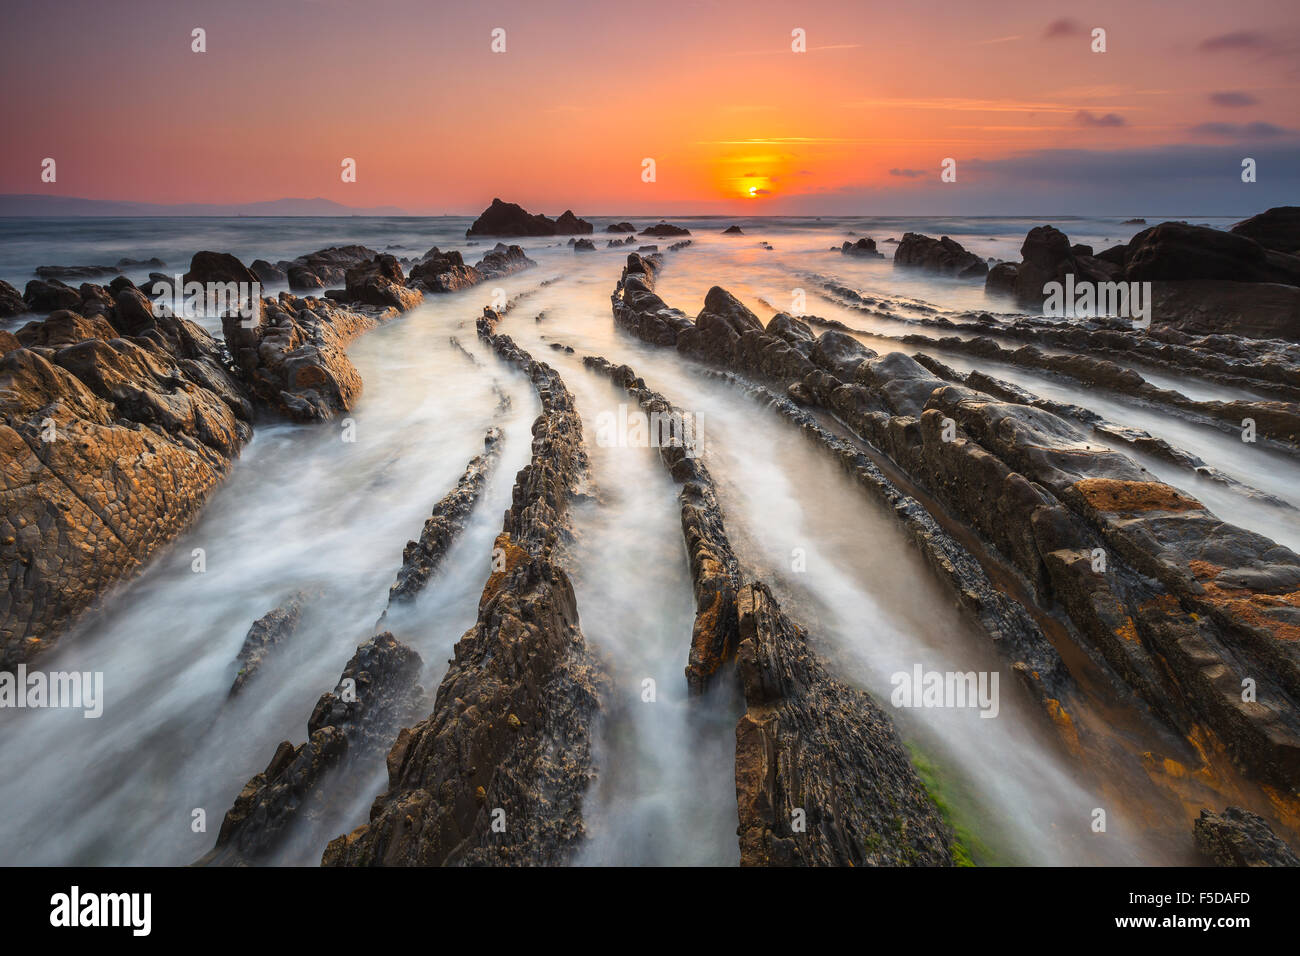 La maravillosa playa del Barrika, Vizcaya, País Vasco, España, al atardecer. Imagen De Stock